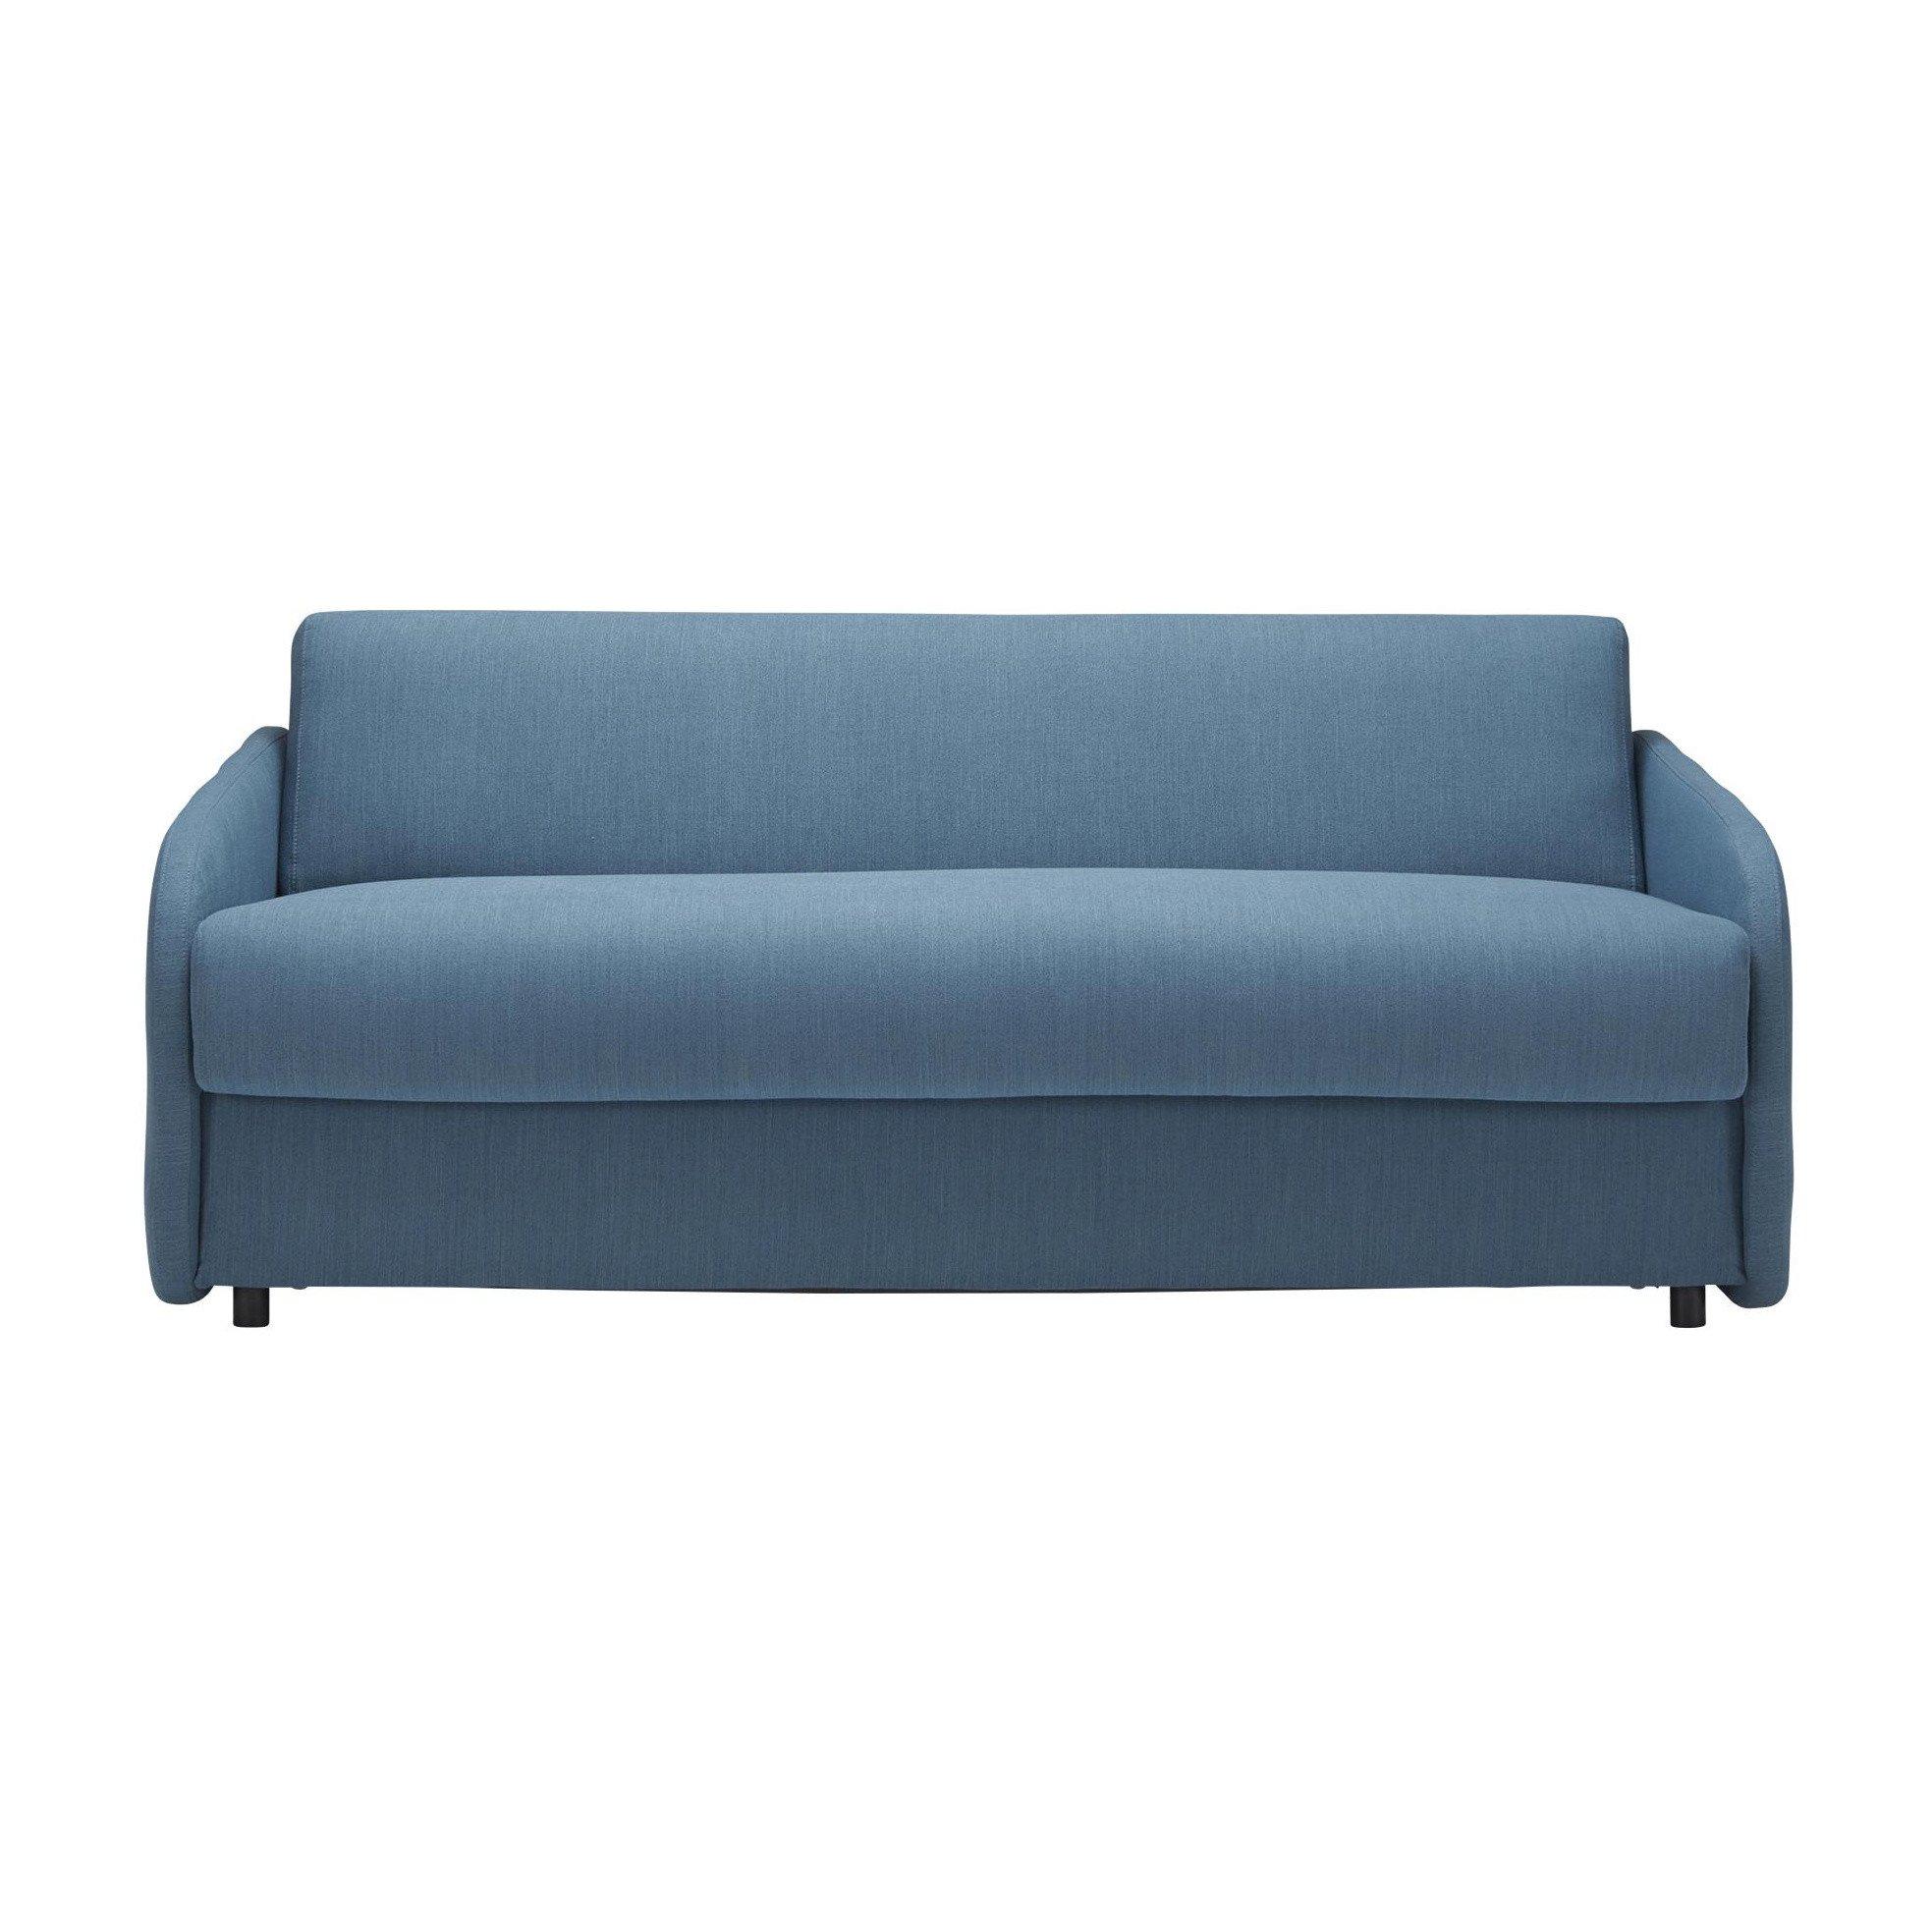 Eivor - Sofá-cama con colchón | Innovation | AmbienteDirect.com